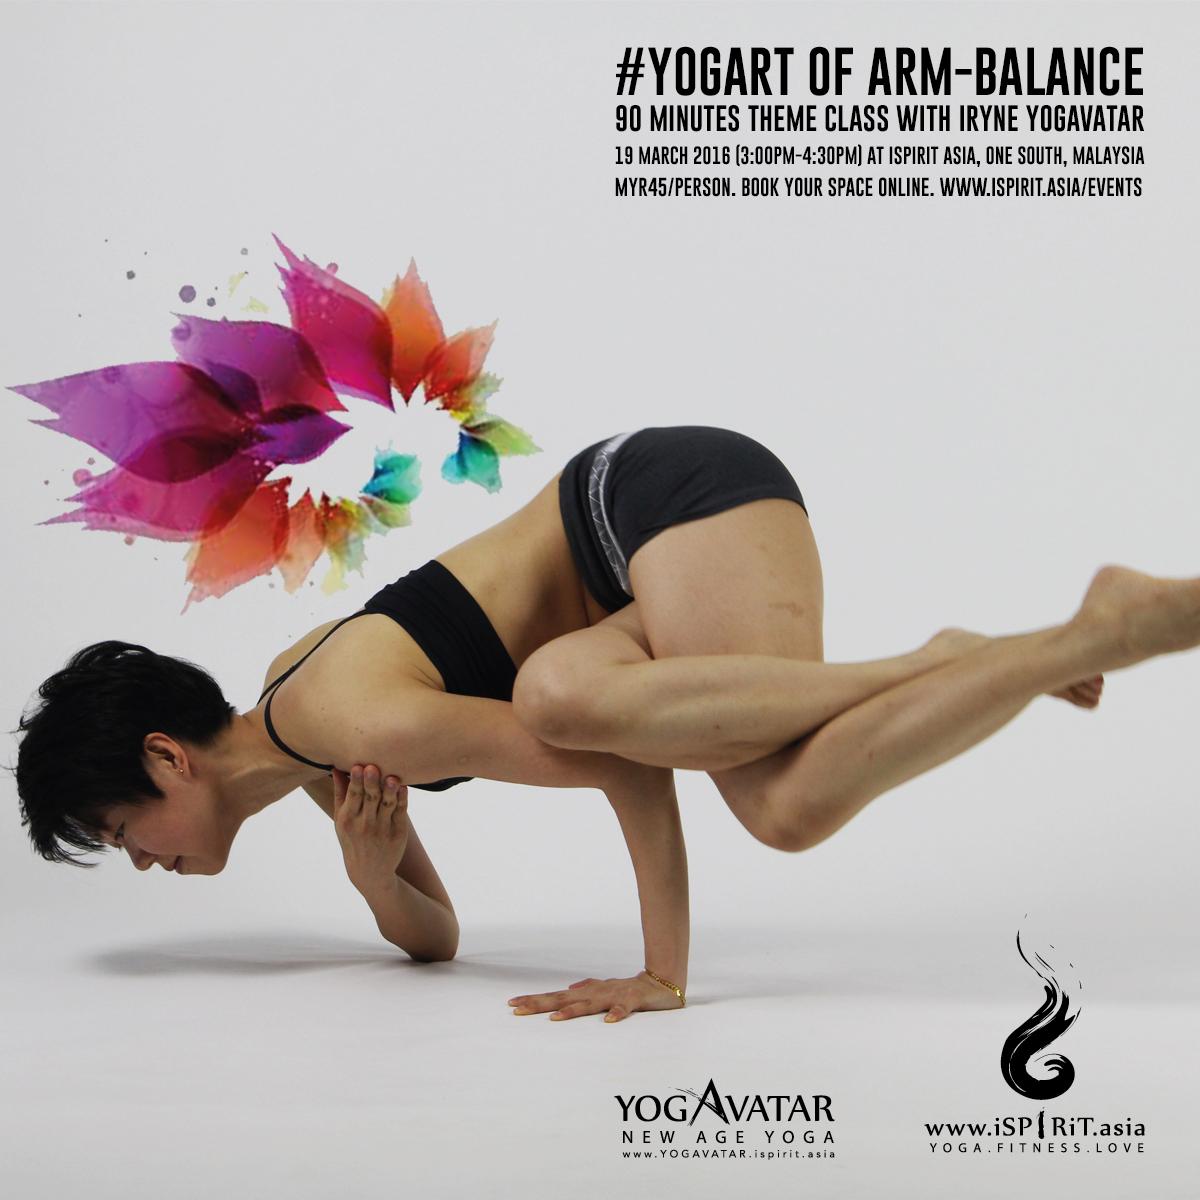 YOGART of arm balance: Theme class with iRyne Yogavatar poster v2